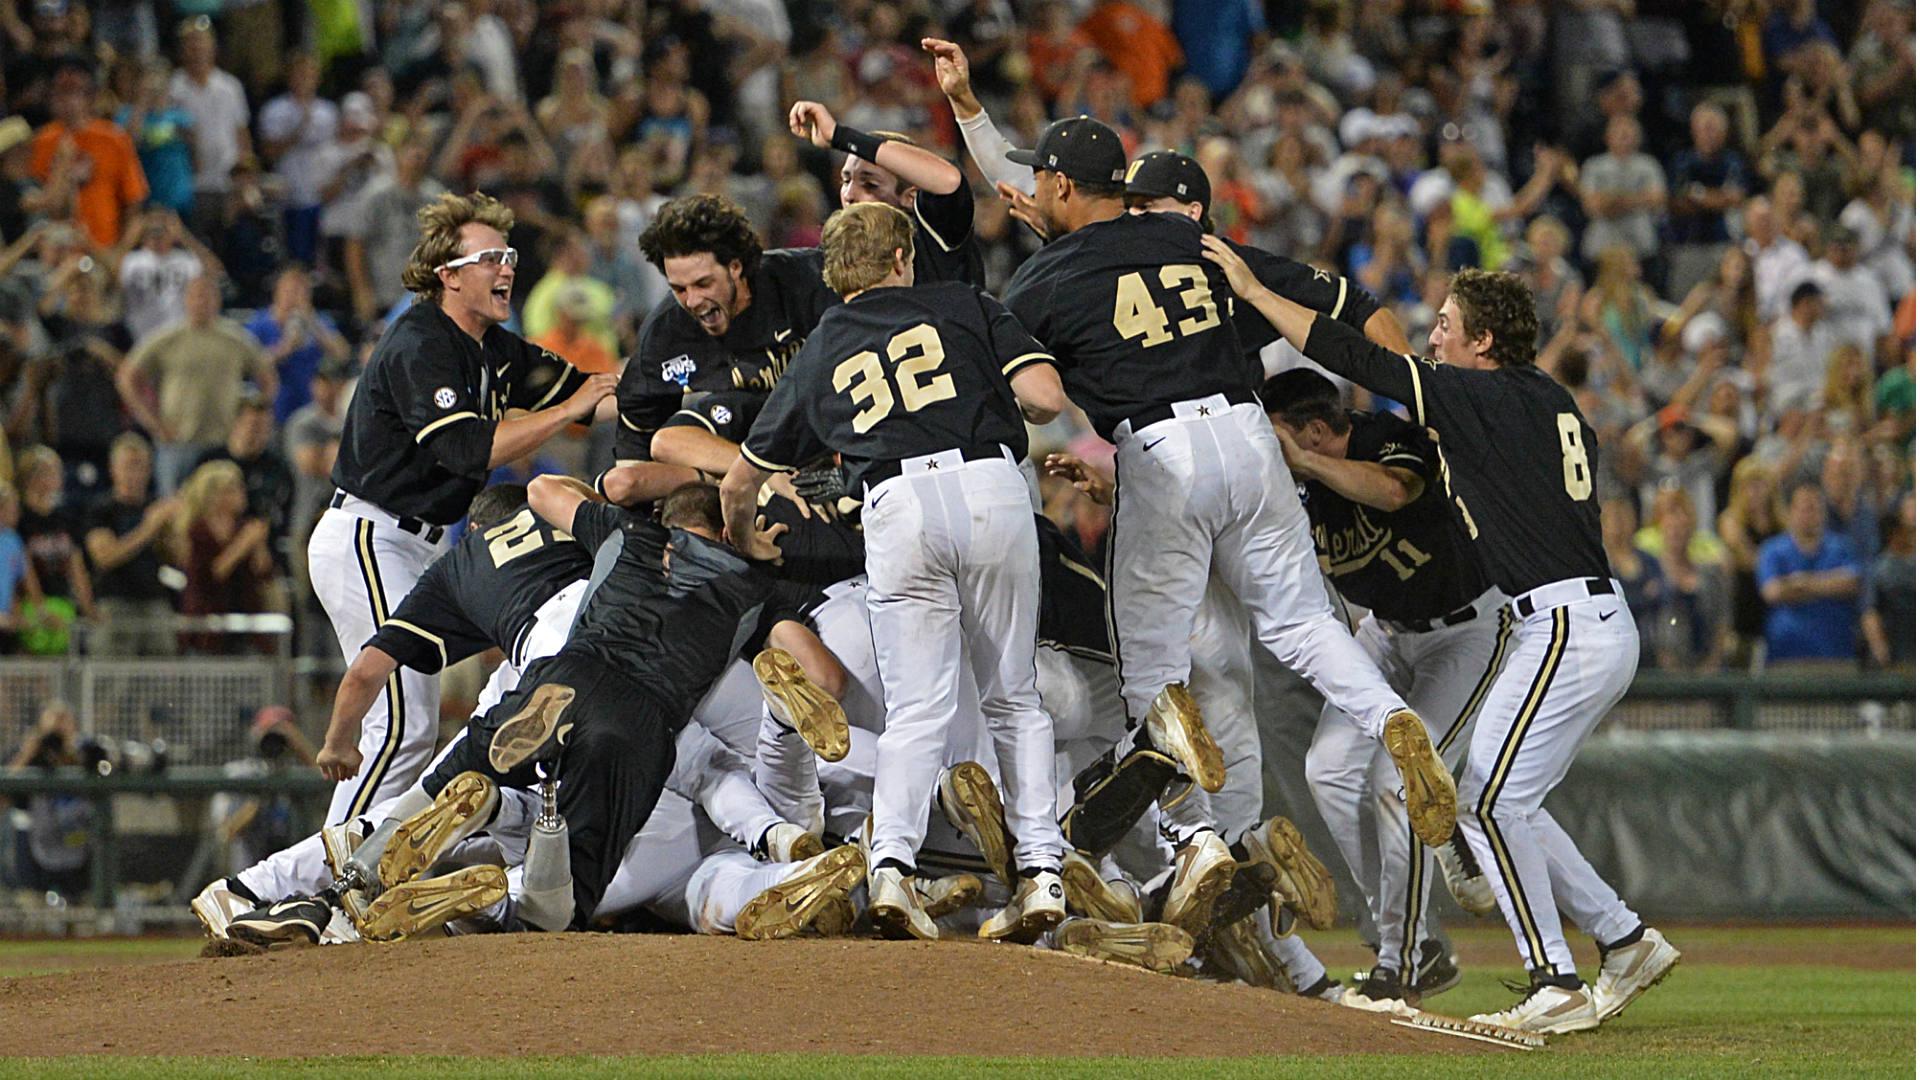 Vanderbilt Baseball Scores, Vanderbilt Baseball Scoreboard and ...